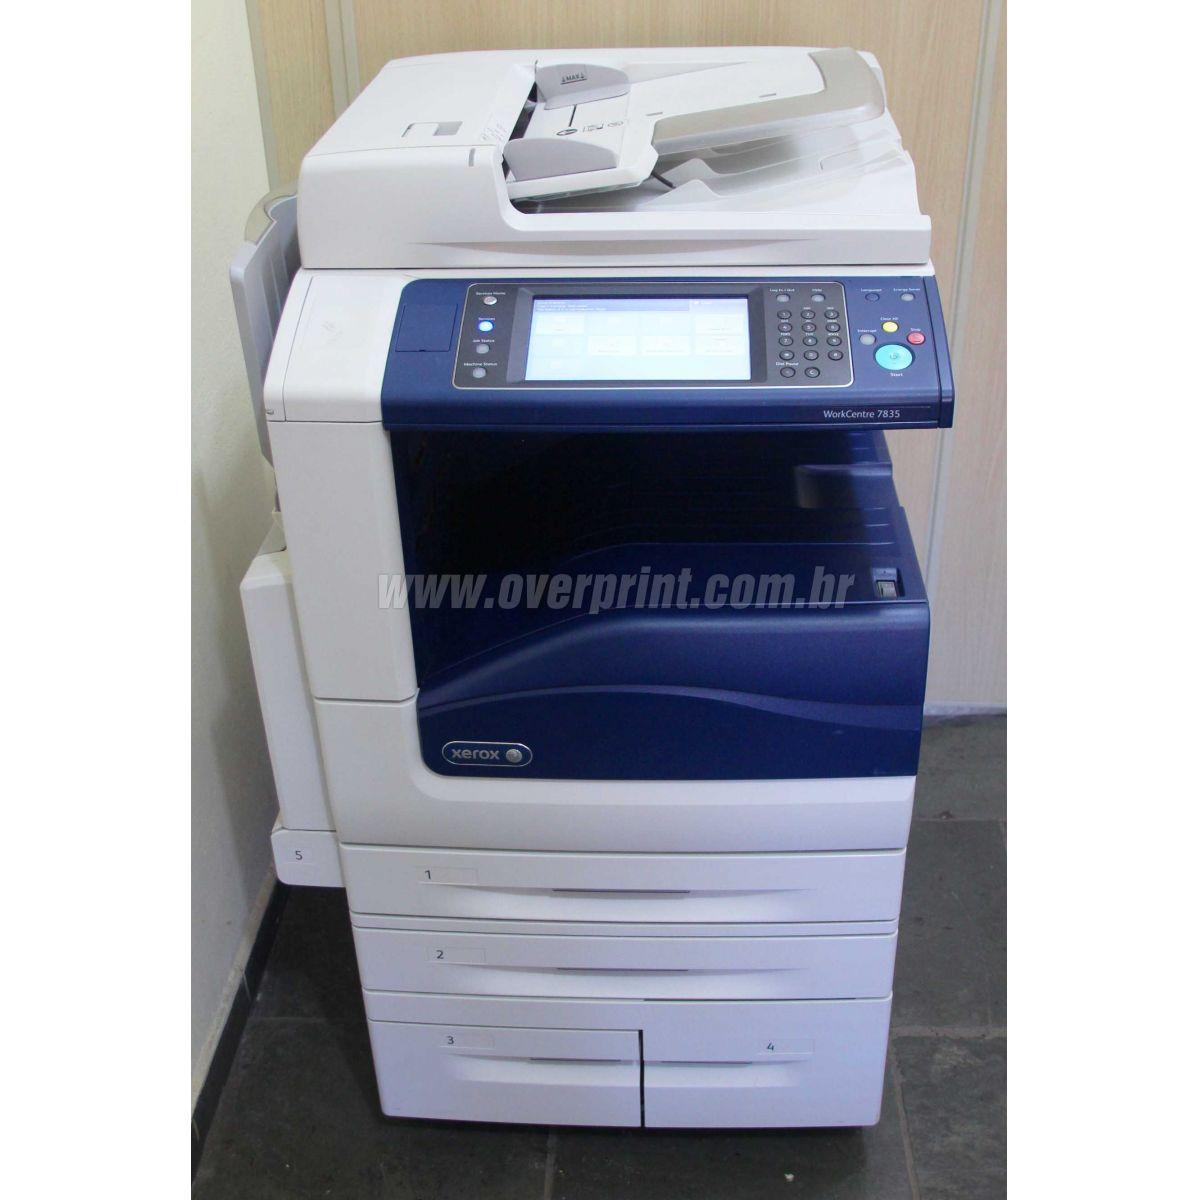 Multifuncional Xerox WorkCentre 7545 - Overprint